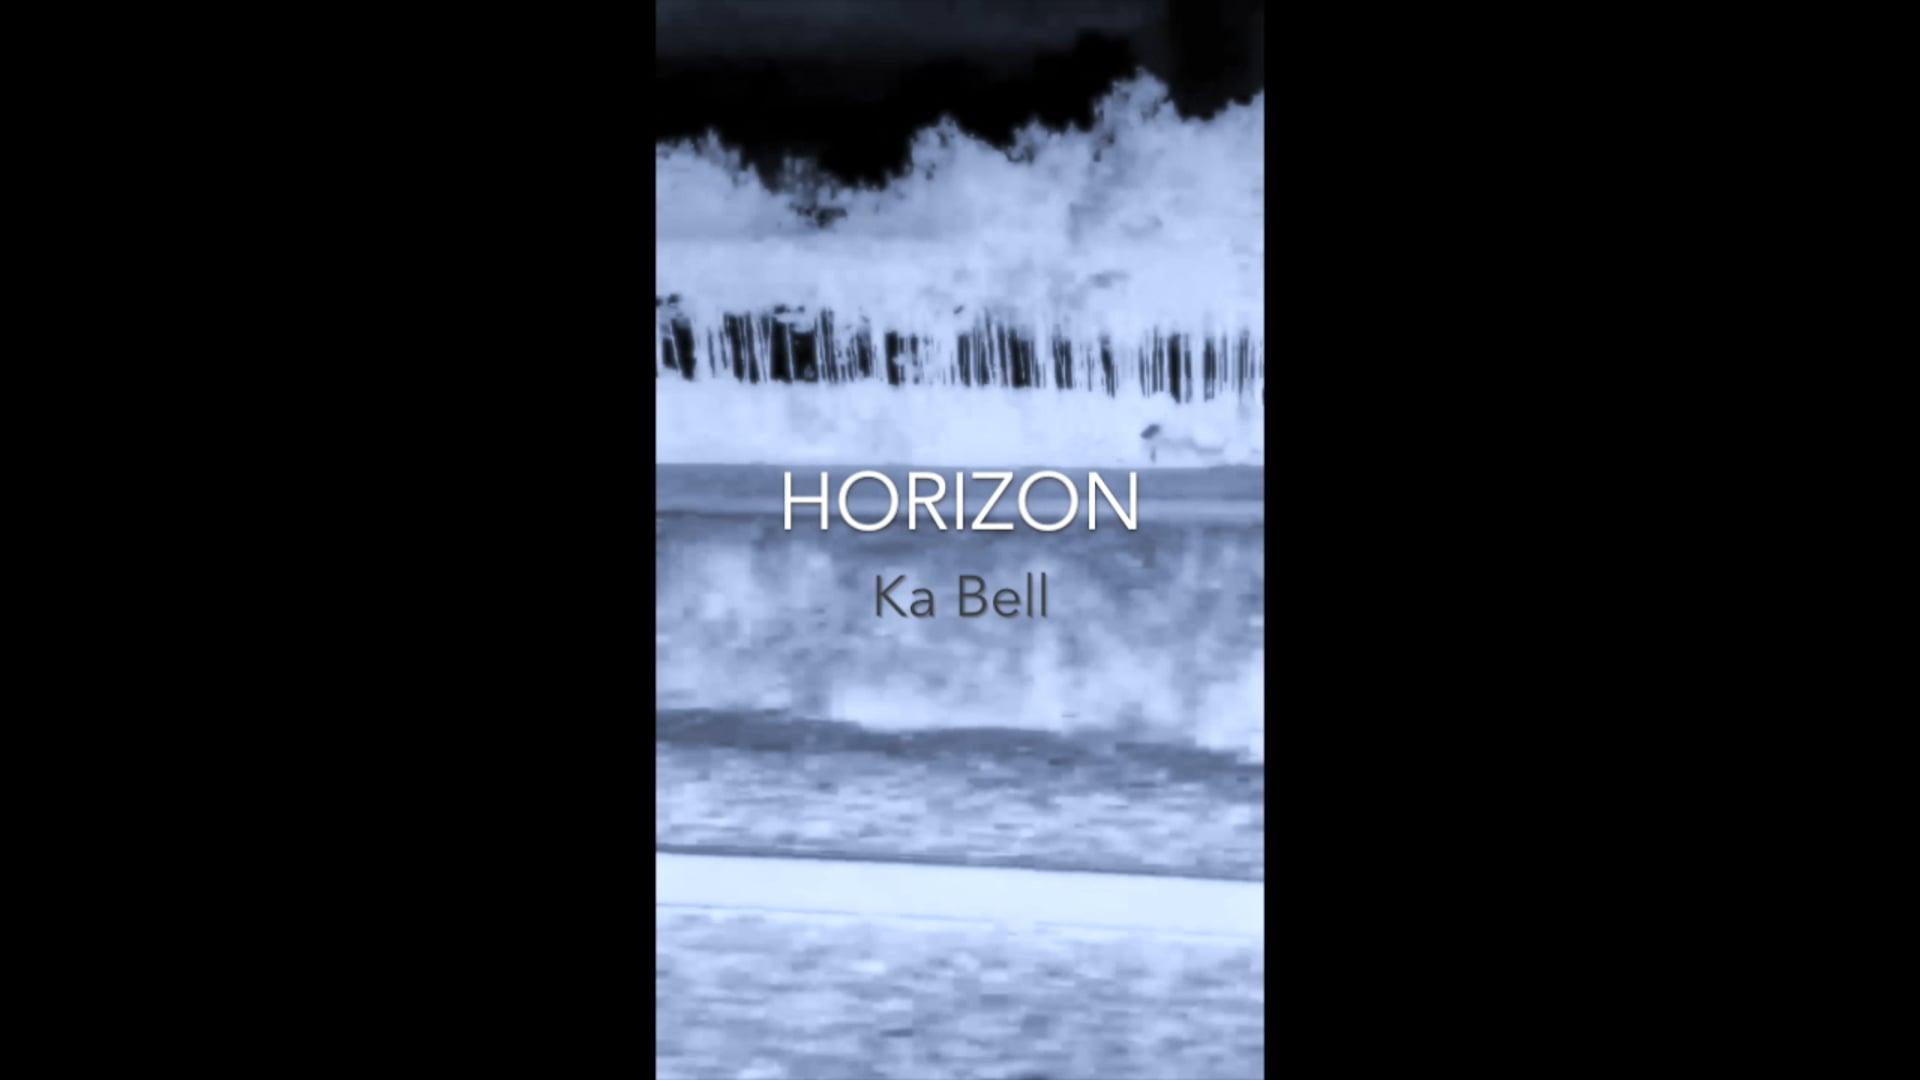 HORIZON by Ka Bell